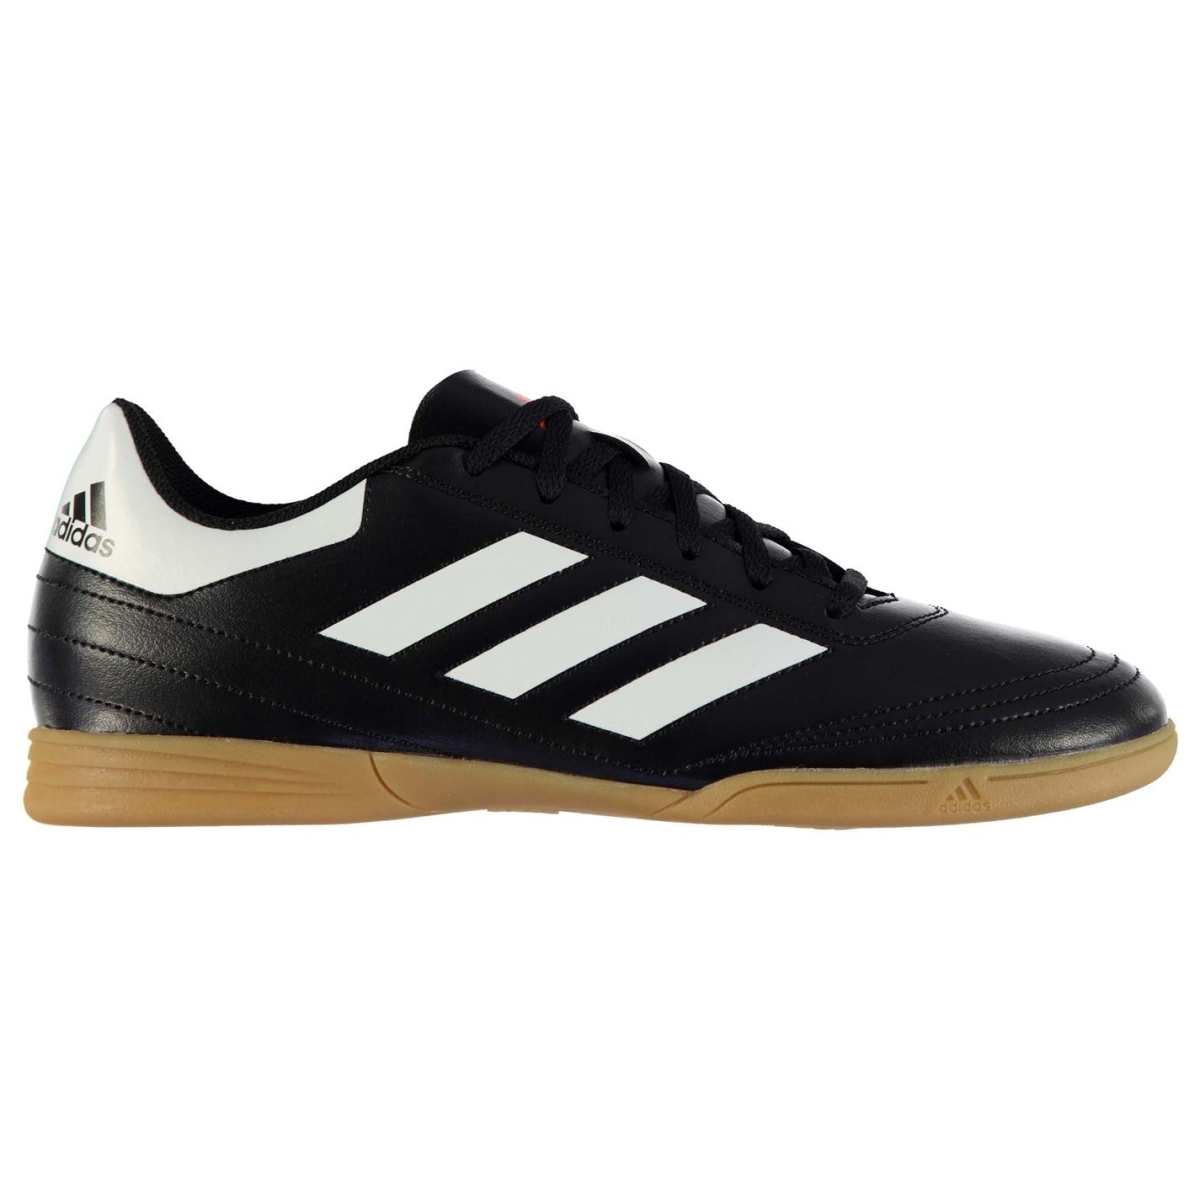 adidas Goletto Hallenschuhe Fußballschuhe Indoor Herren Indoorschuhe 3042